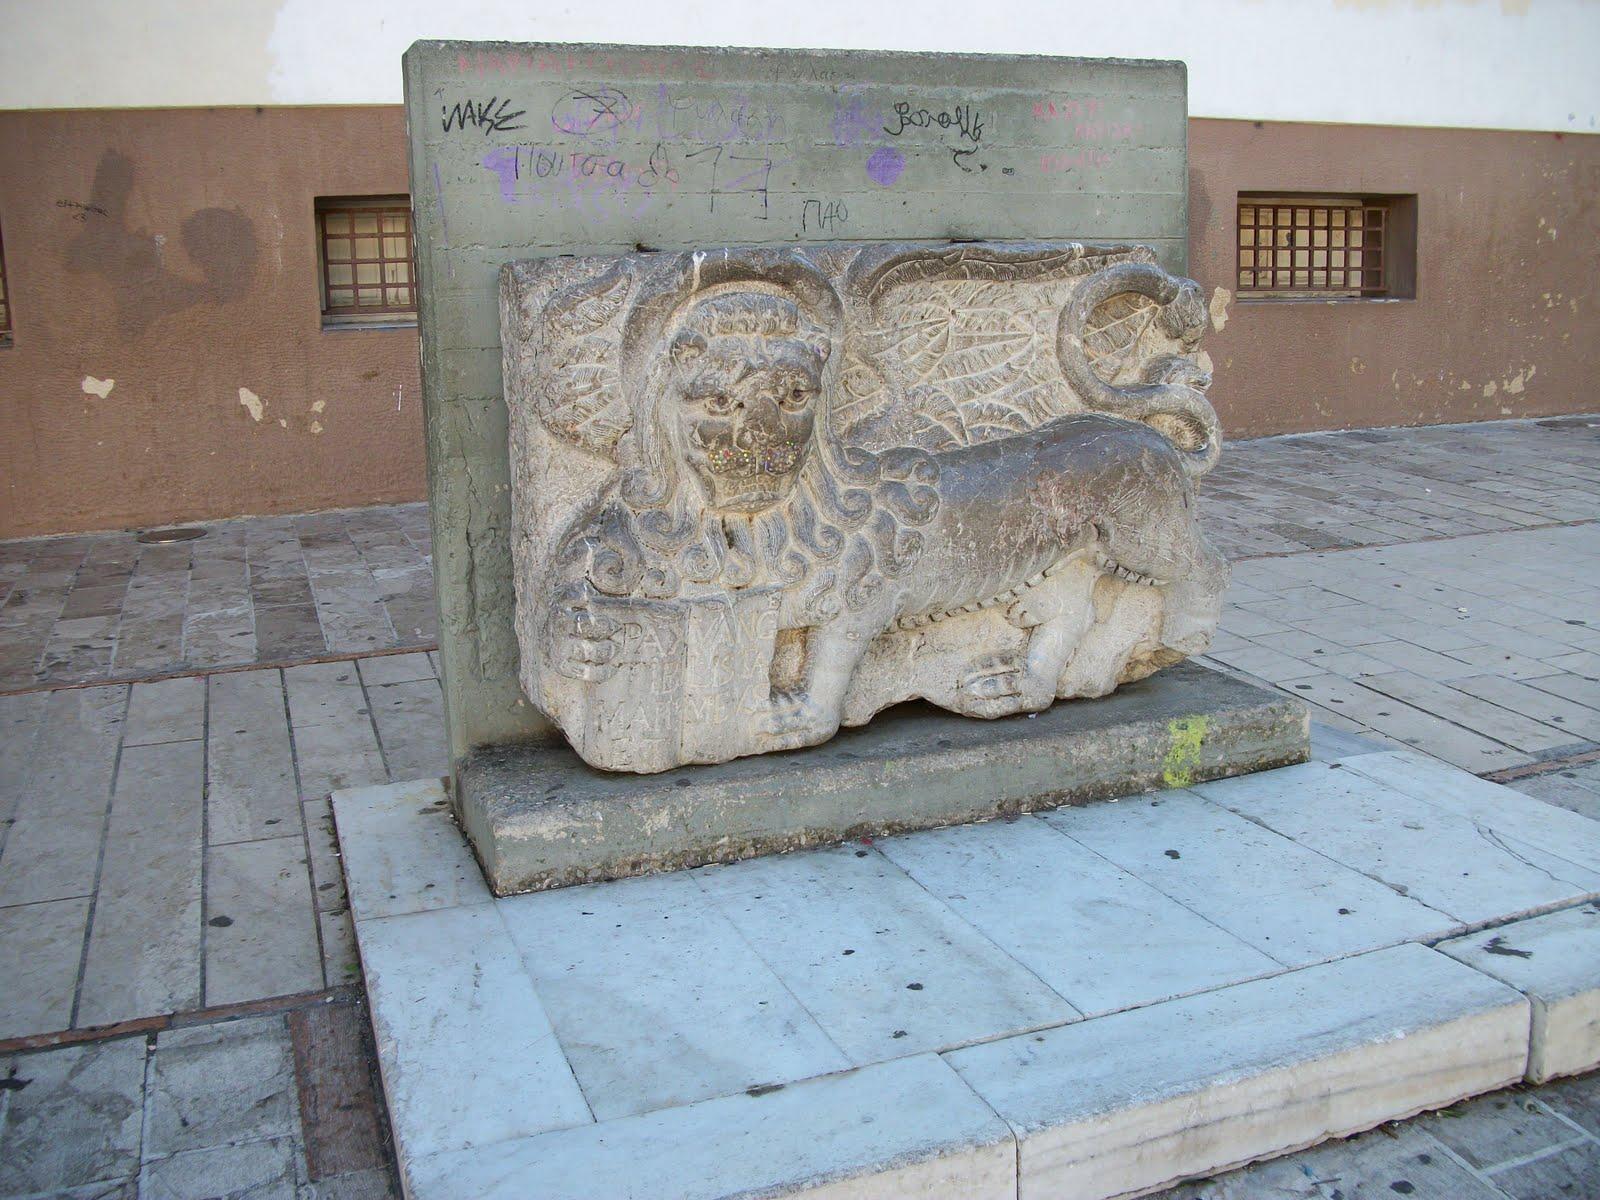 Löwenpenis